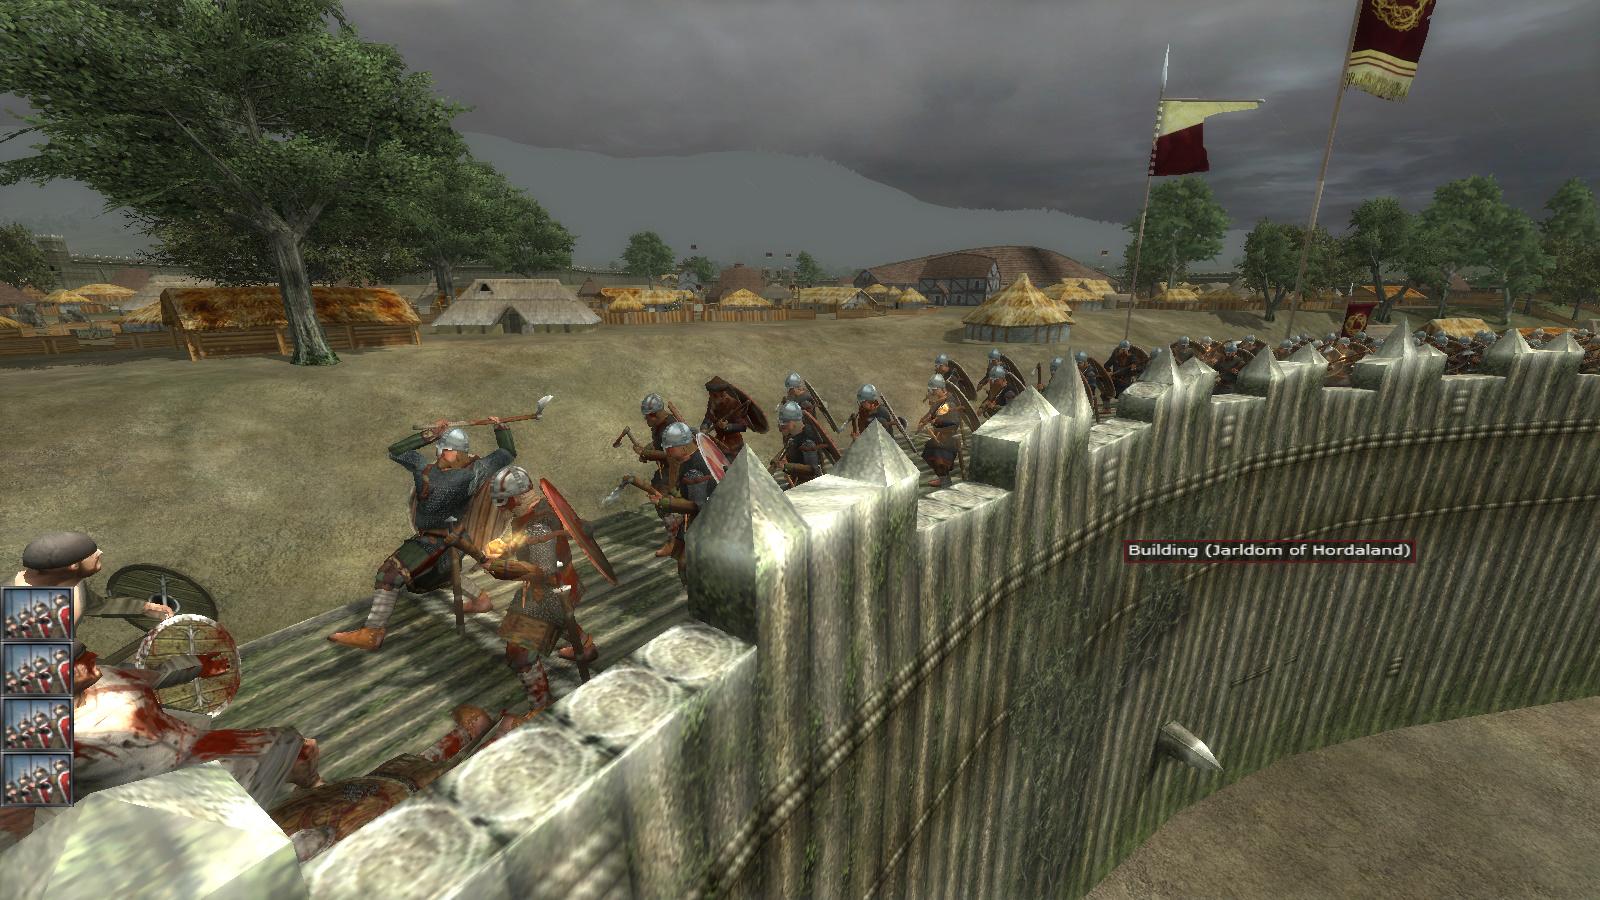 The Last Kingdom (M2TW) mod for Medieval II: Total War ...